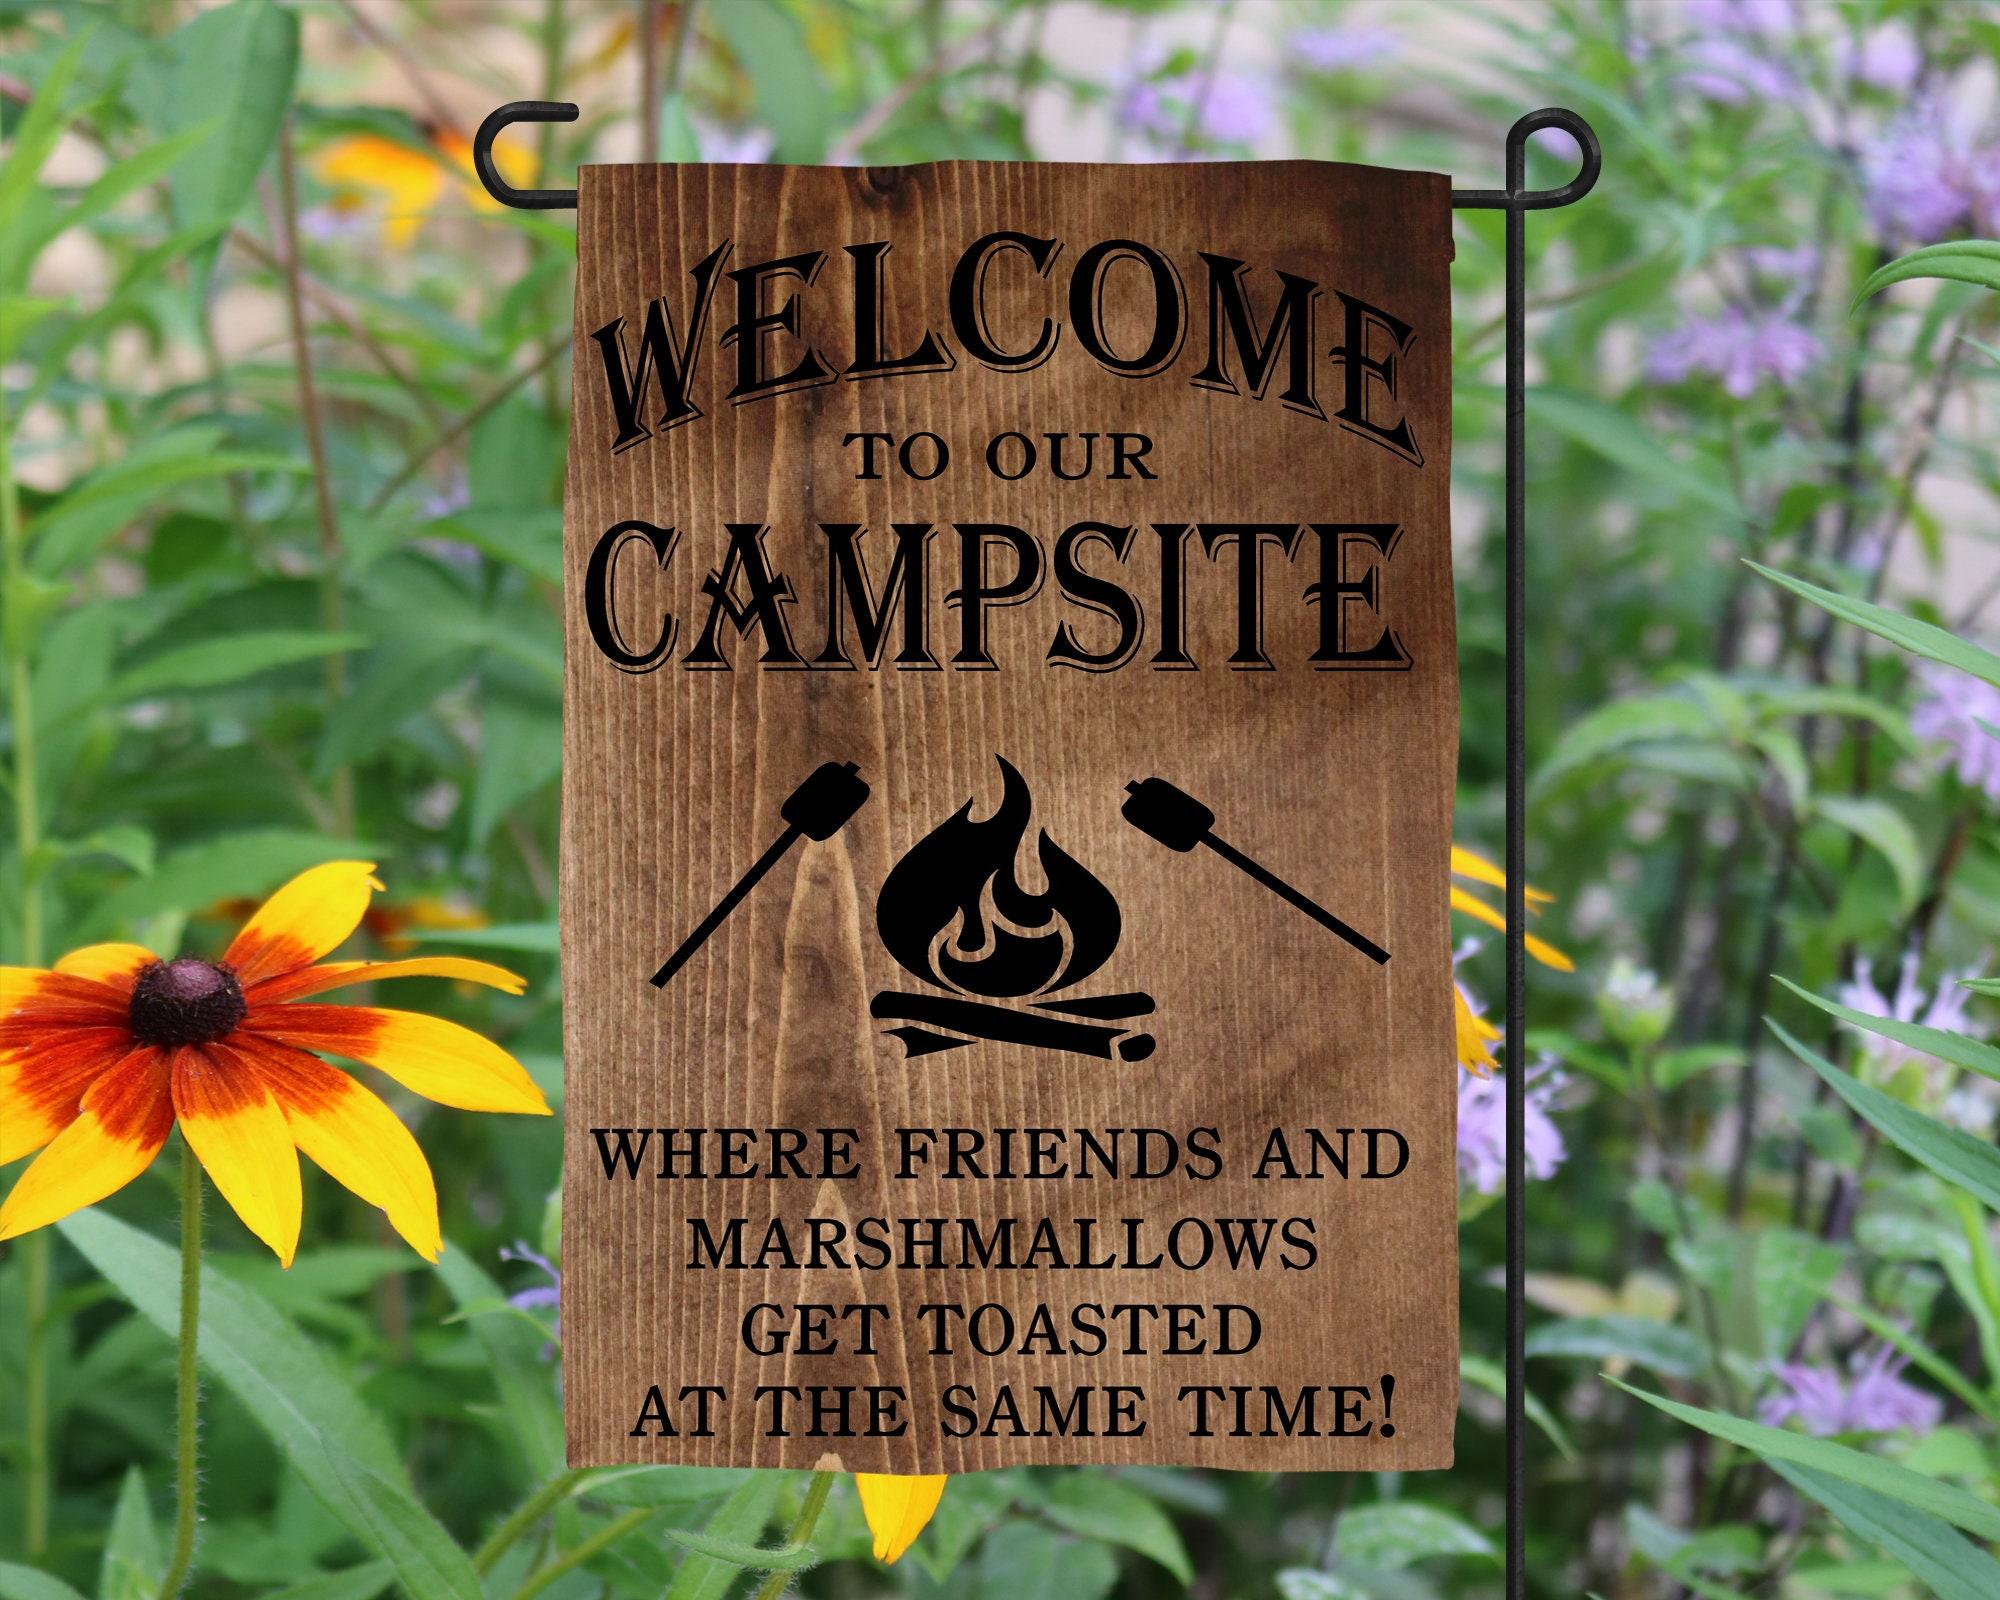 Welcome Campsite Marshmallows Friends Garden Flag Camper Decor ...